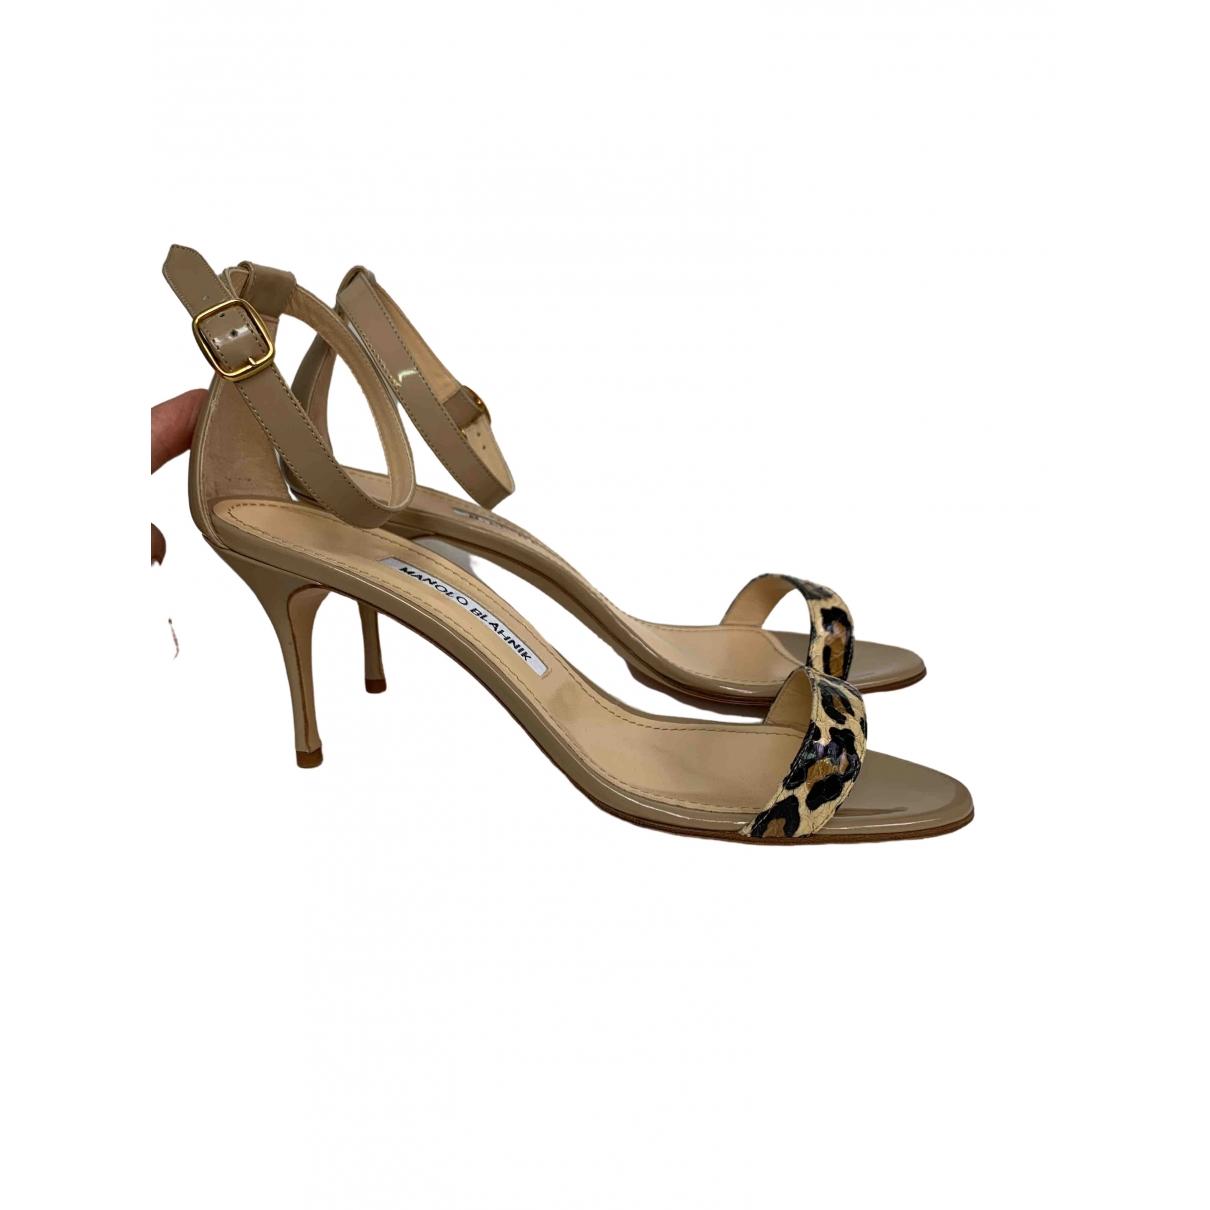 Manolo Blahnik - Sandales   pour femme en cuir - beige